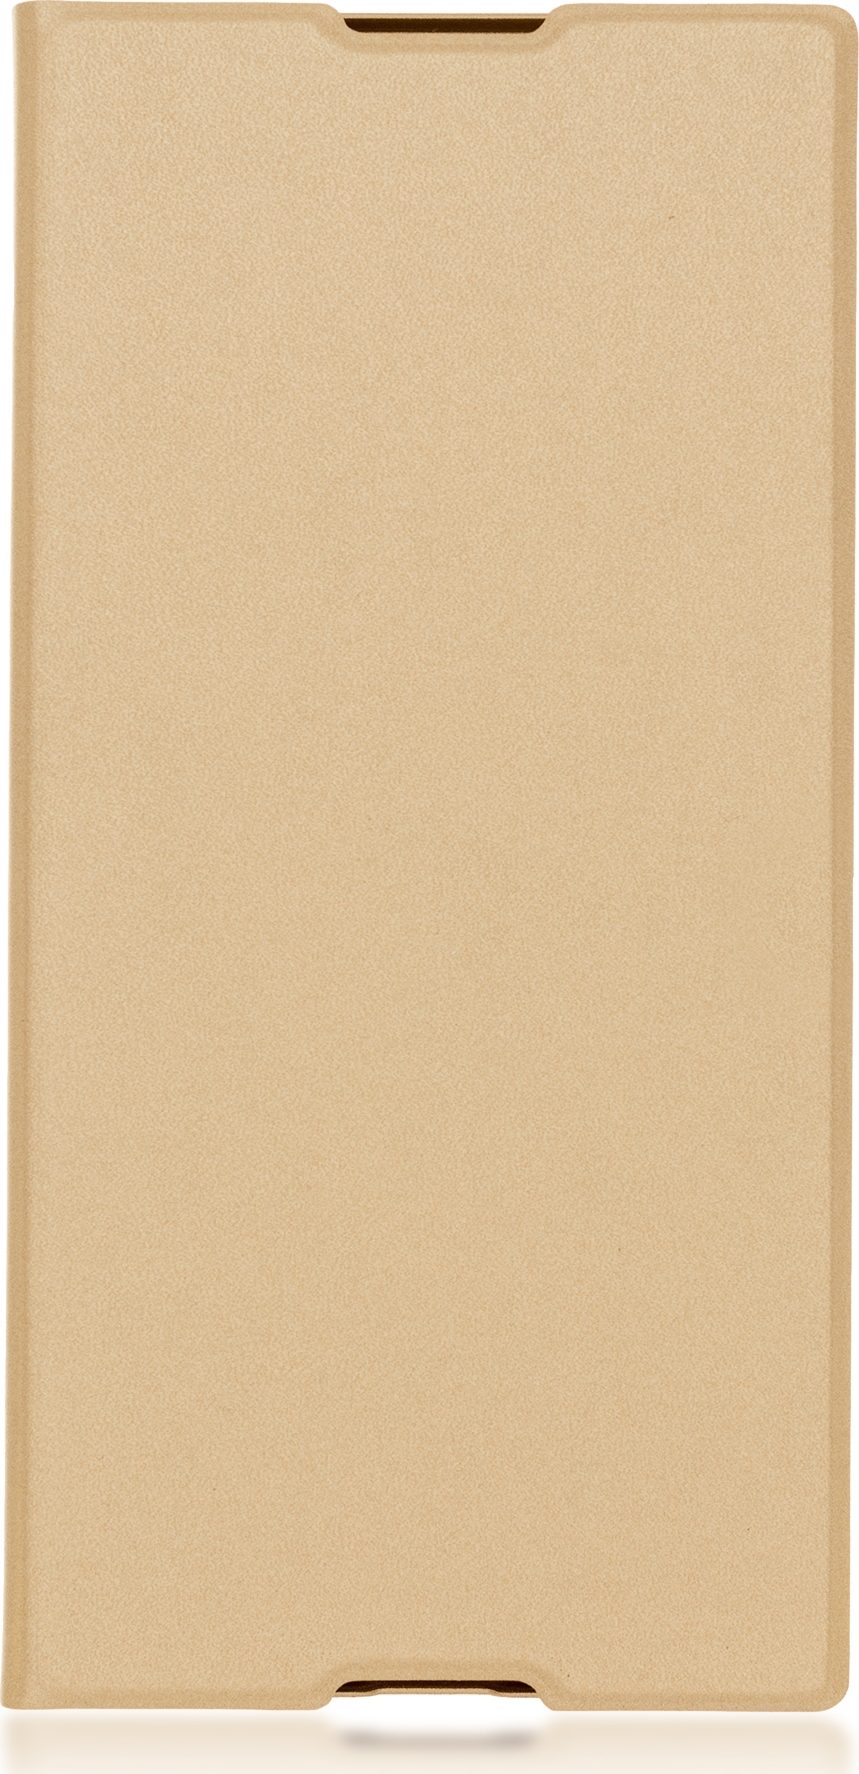 Чехол Brosco Book для Sony Xperia XA1 Ultra, золотой смартфон sony xperia xa1 ultra dual 32 гб белый g3212white